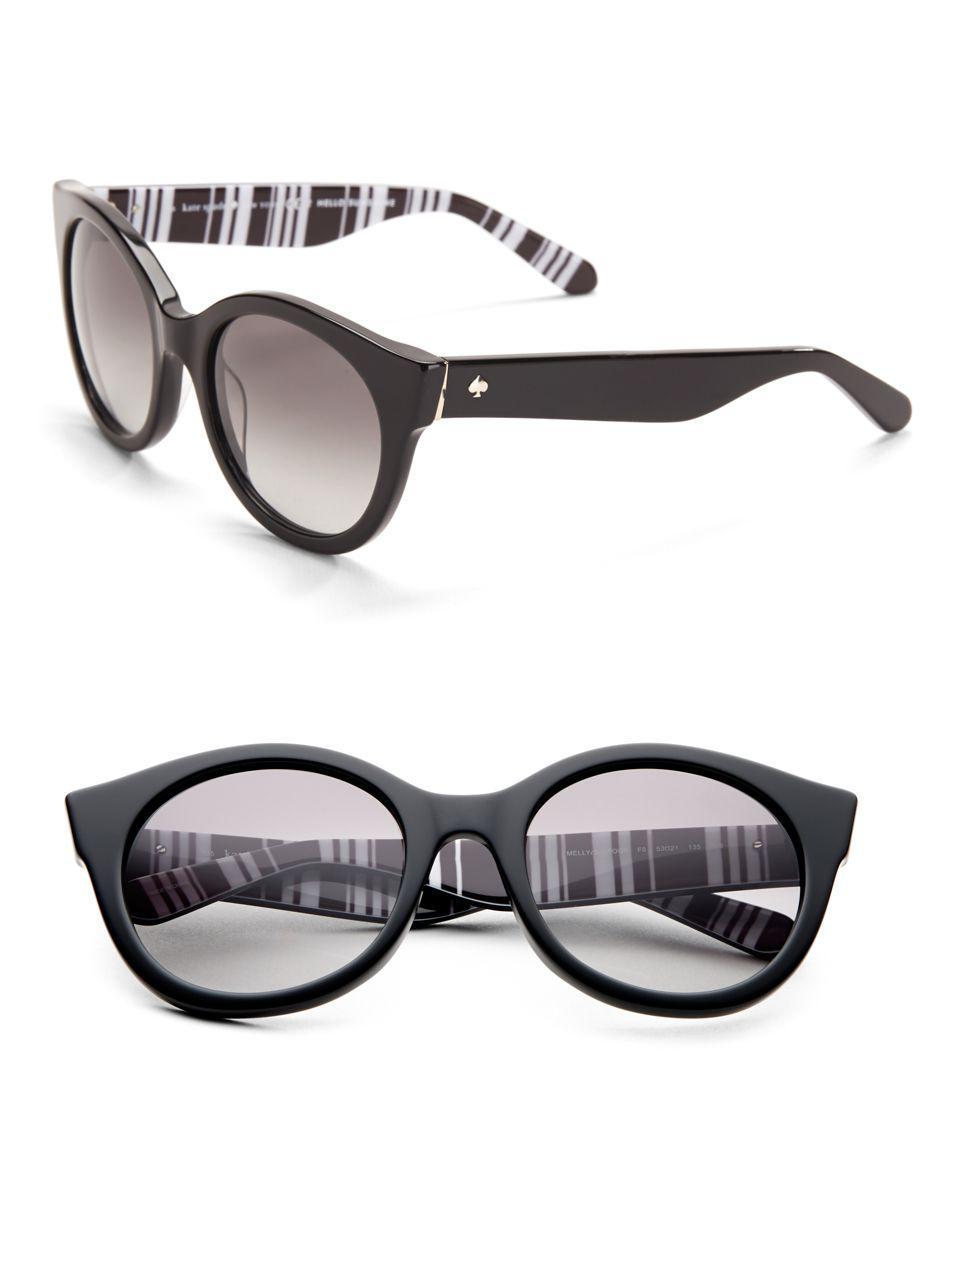 b5c9b18b26 Lyst - Kate Spade Melly 53mm Round Sunglasses in Black